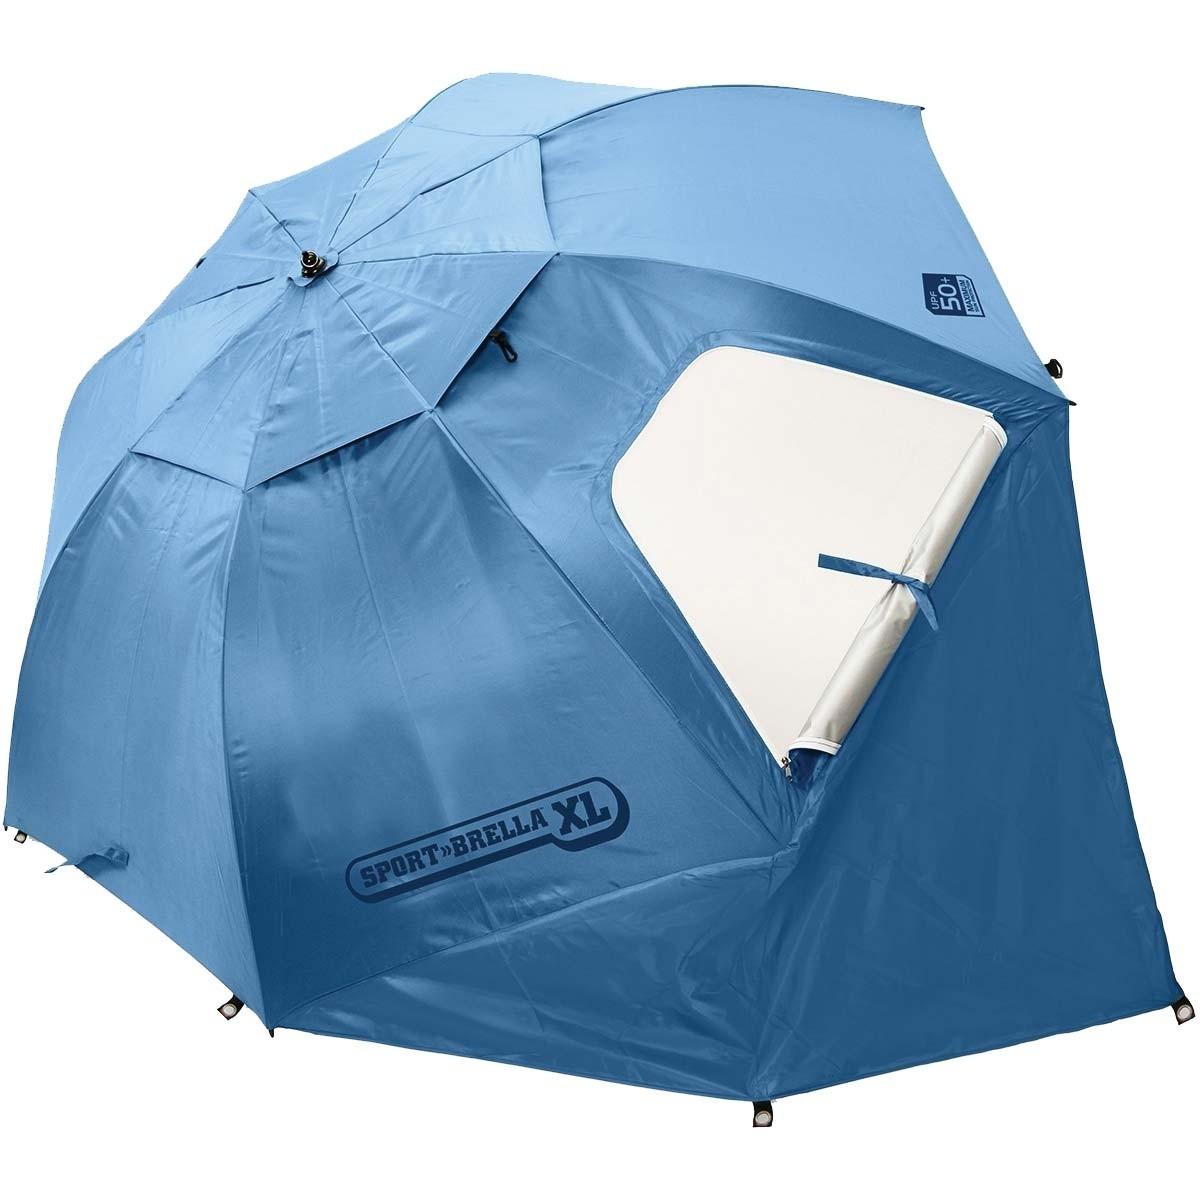 super brella chair navy blue dining chairs set of 2 sklz sport xl 9 sun weather shelter